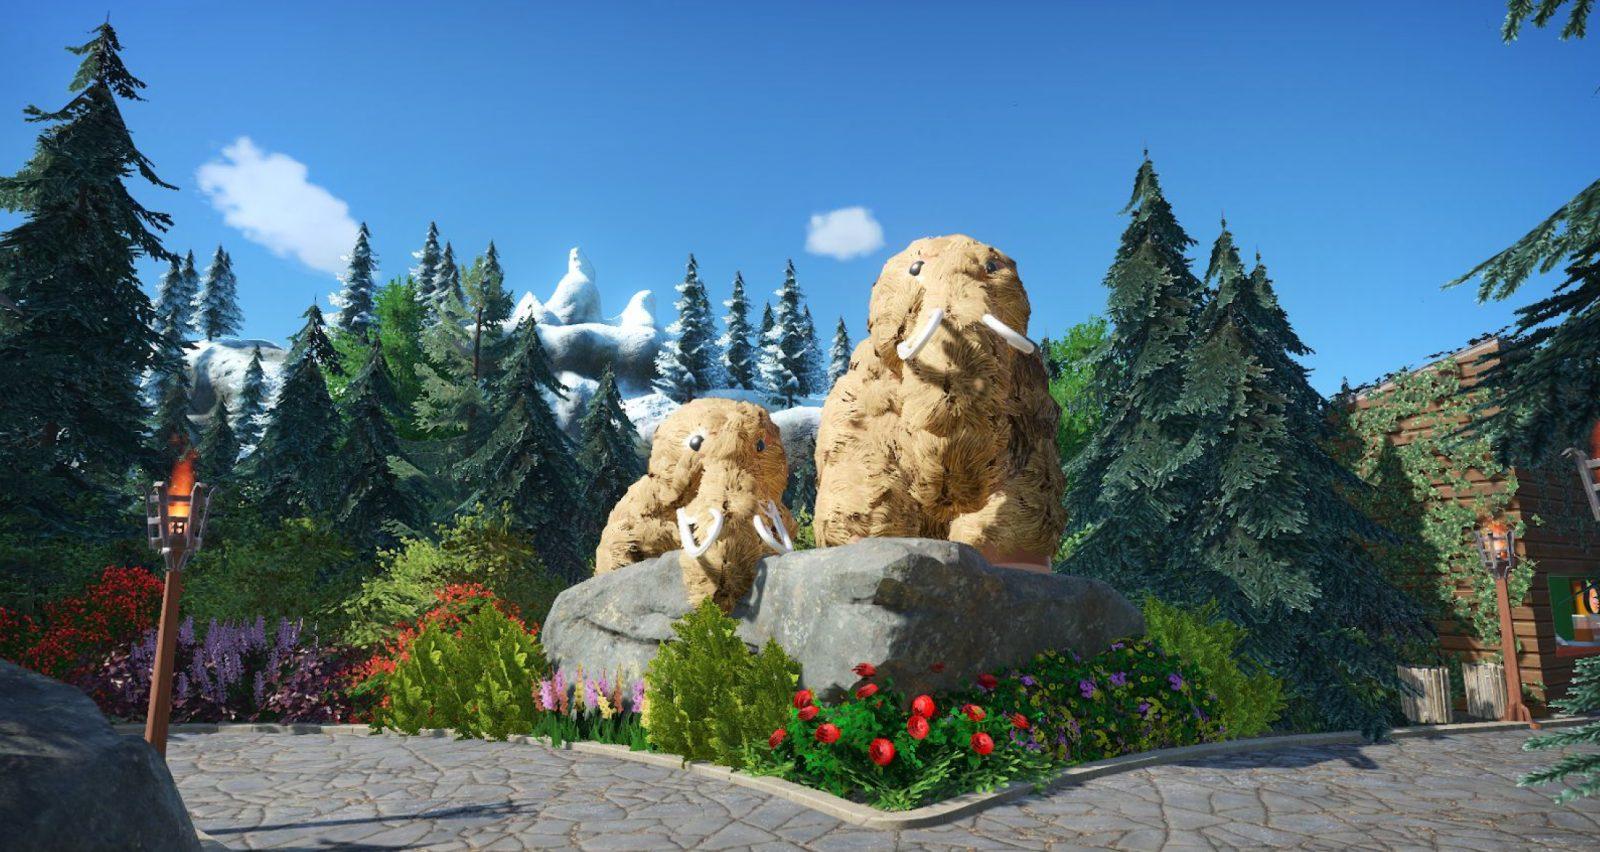 theme park design competition winner